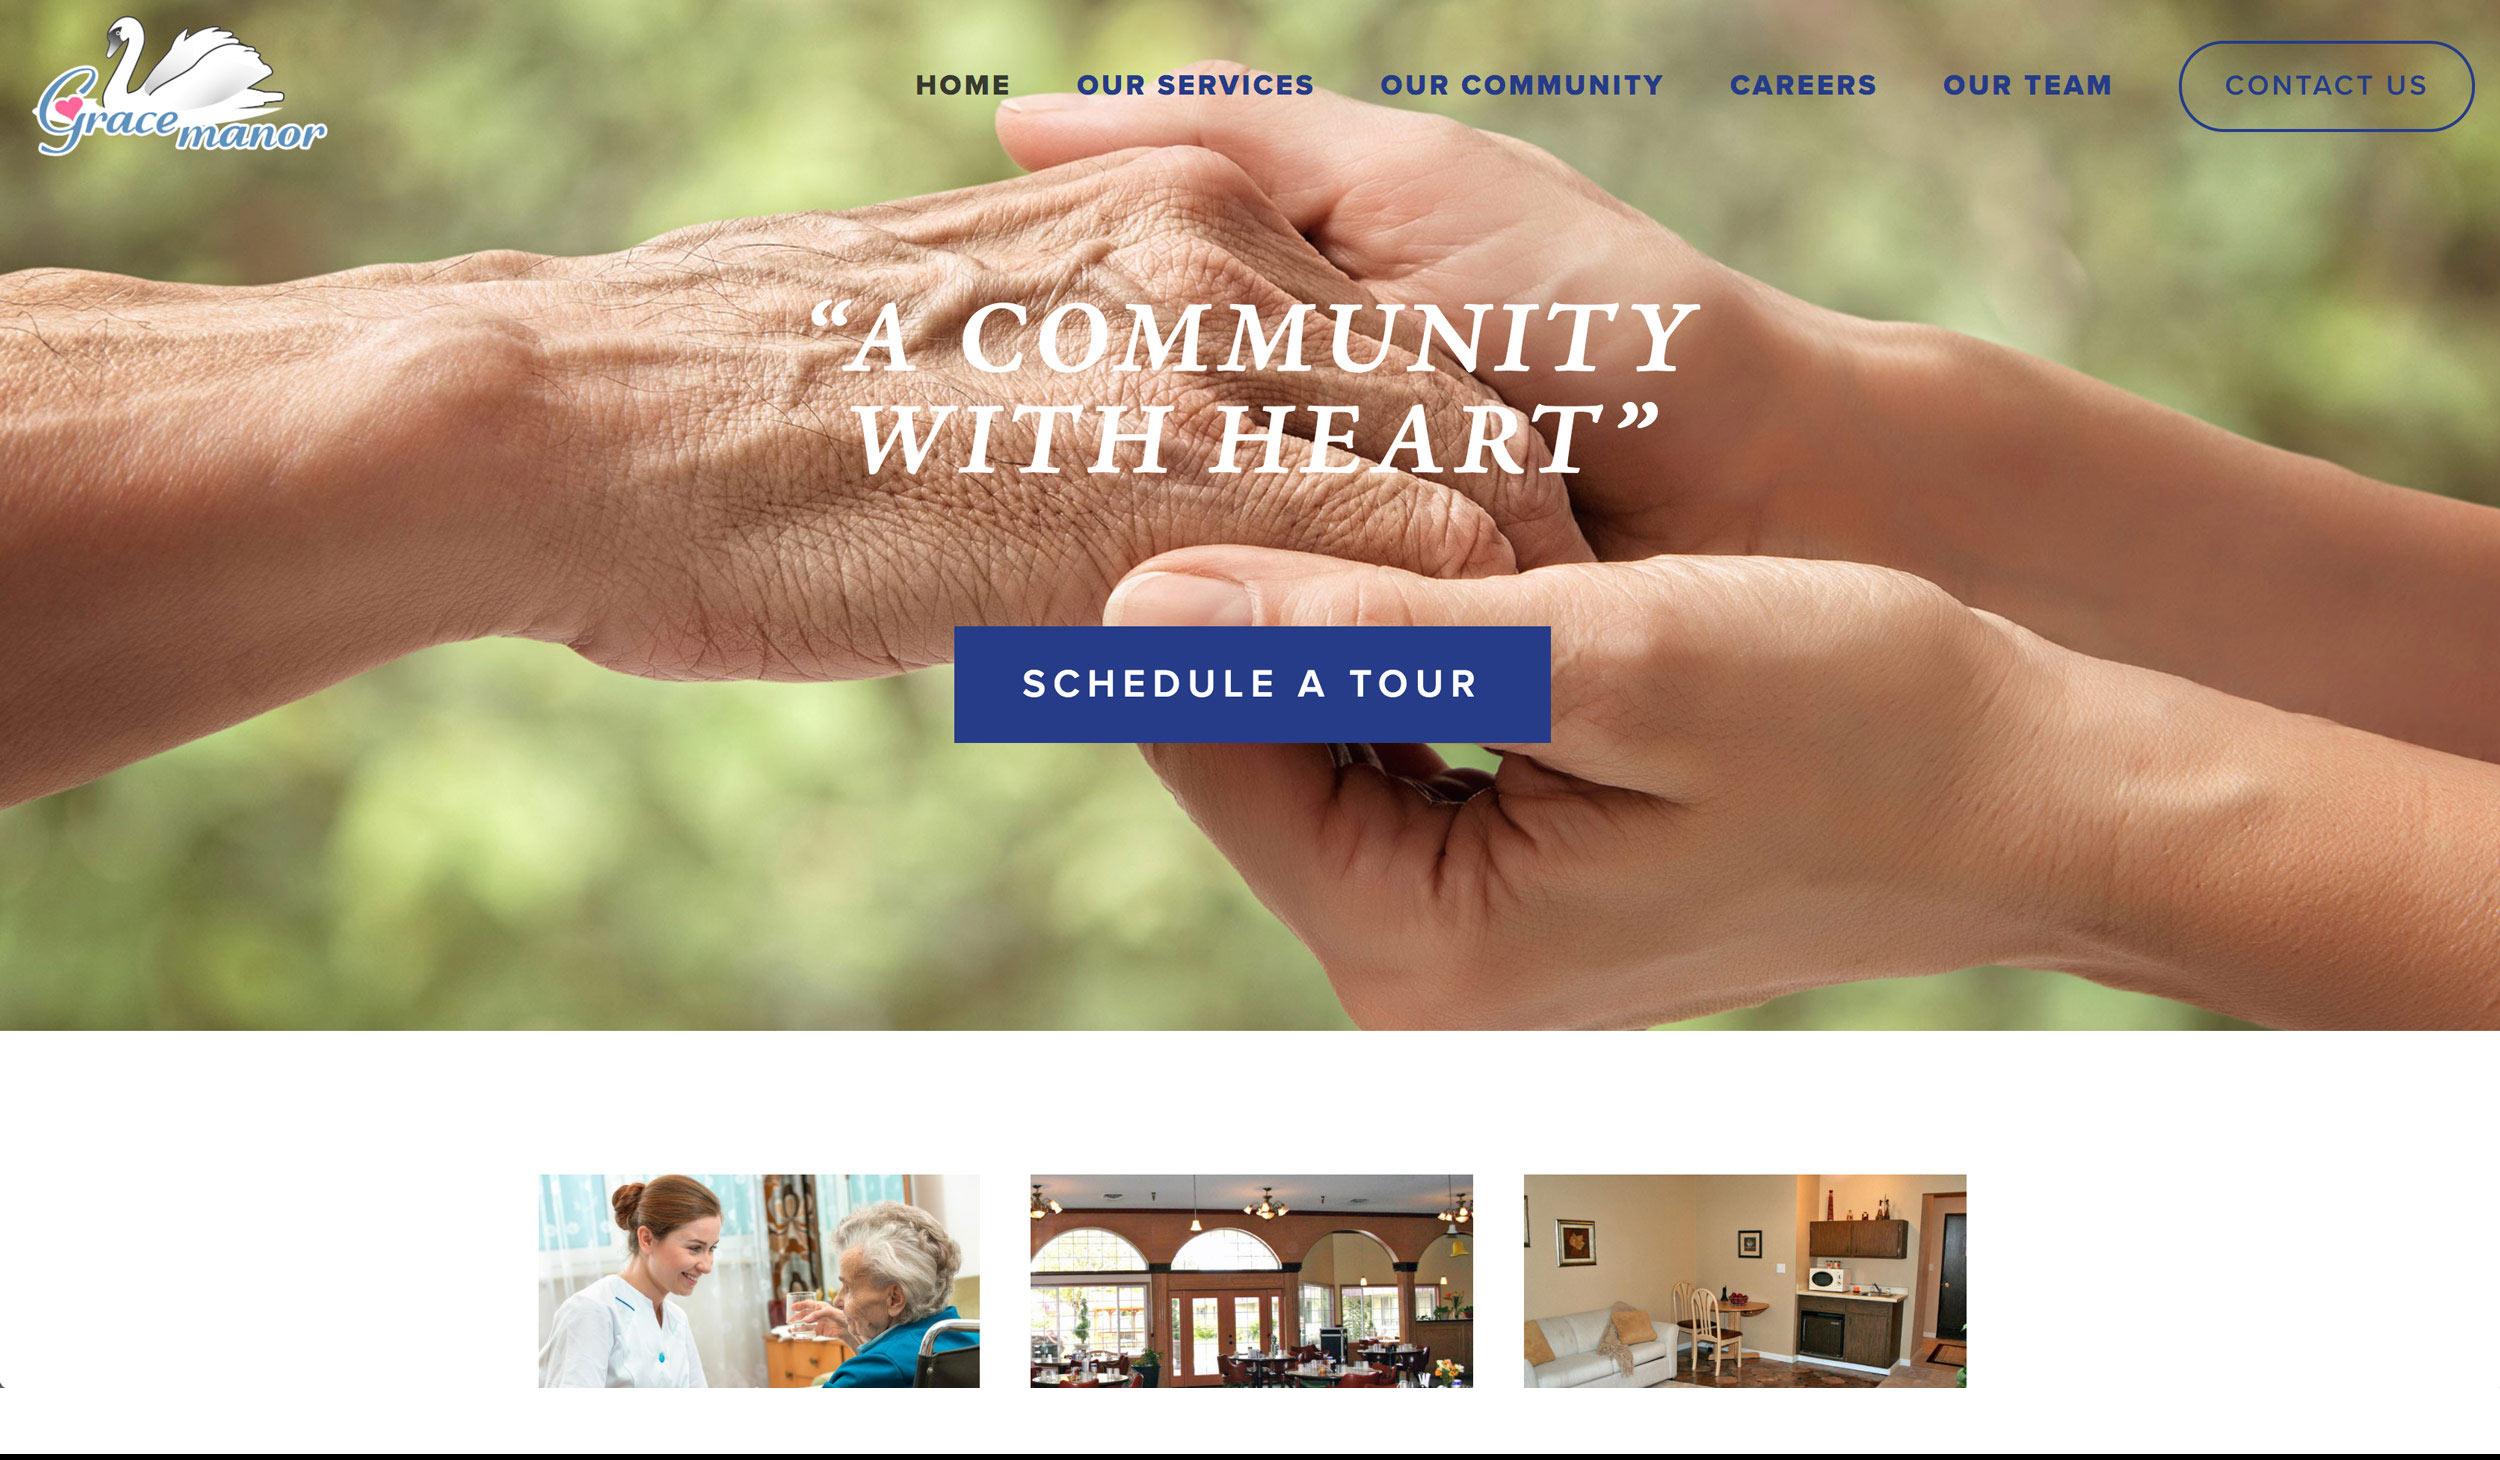 Grace Manor Homepage